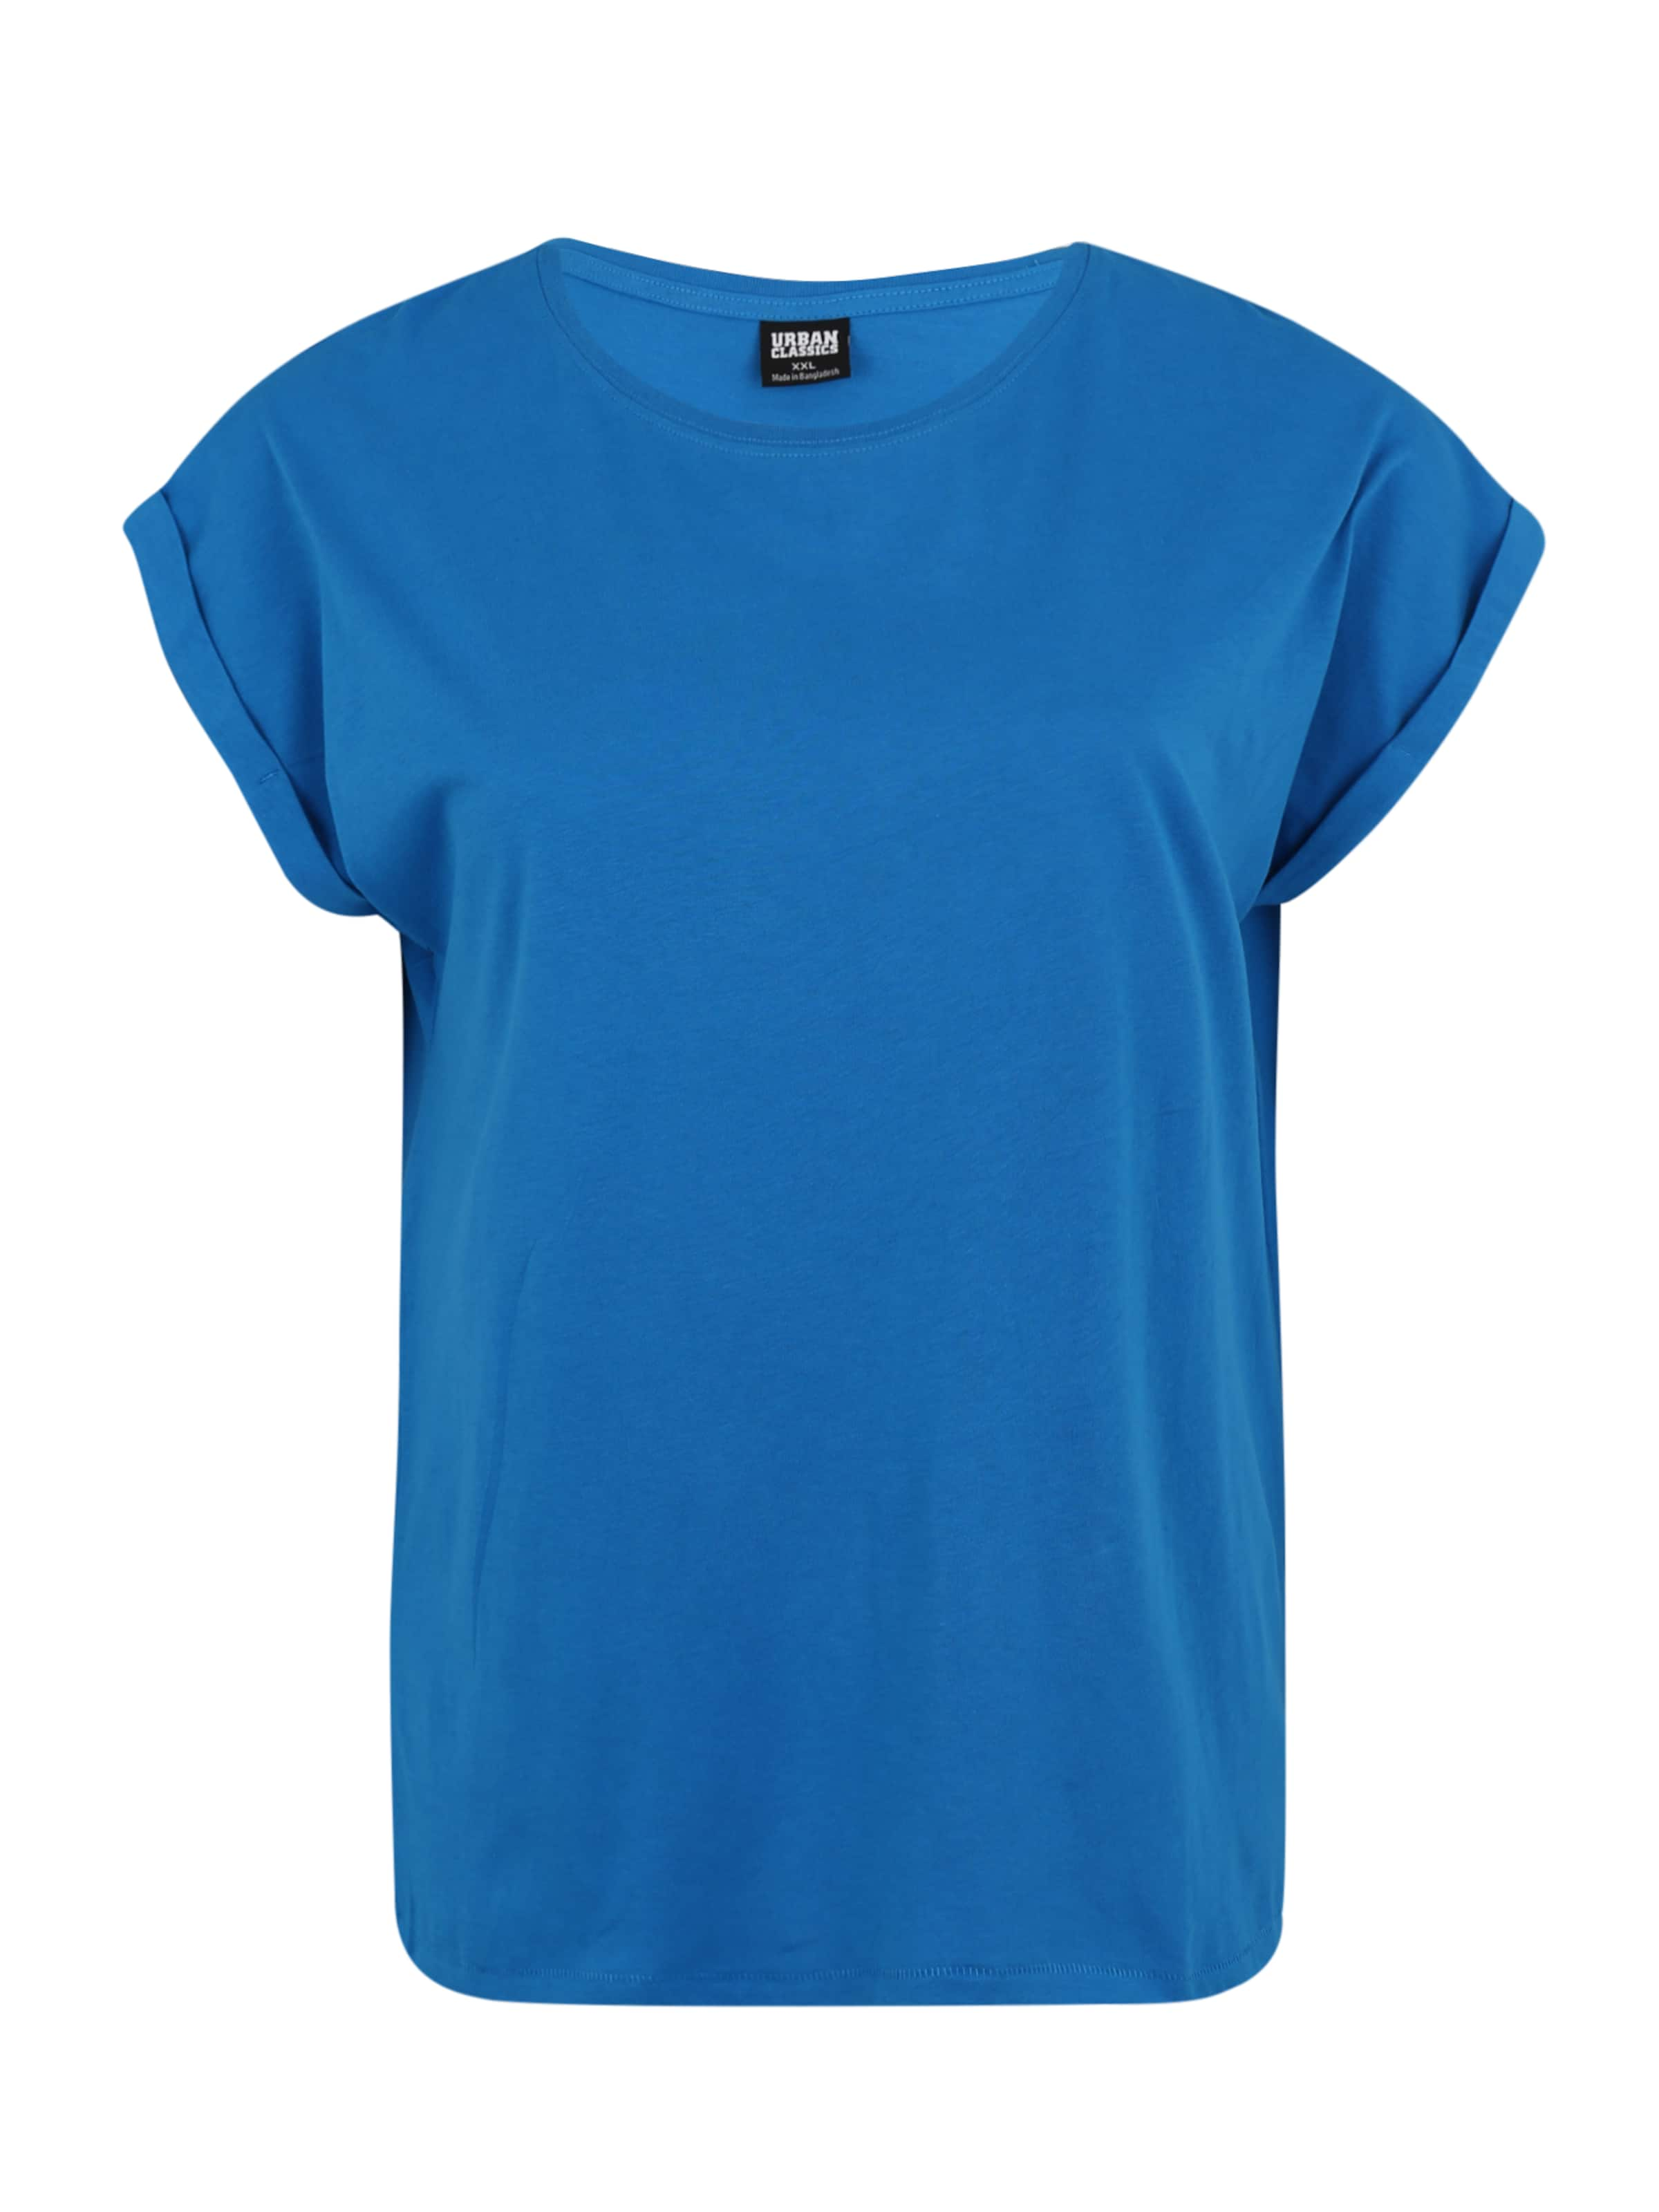 Classics Curvy T En Urban shirt Bleu 6b7gyvYf